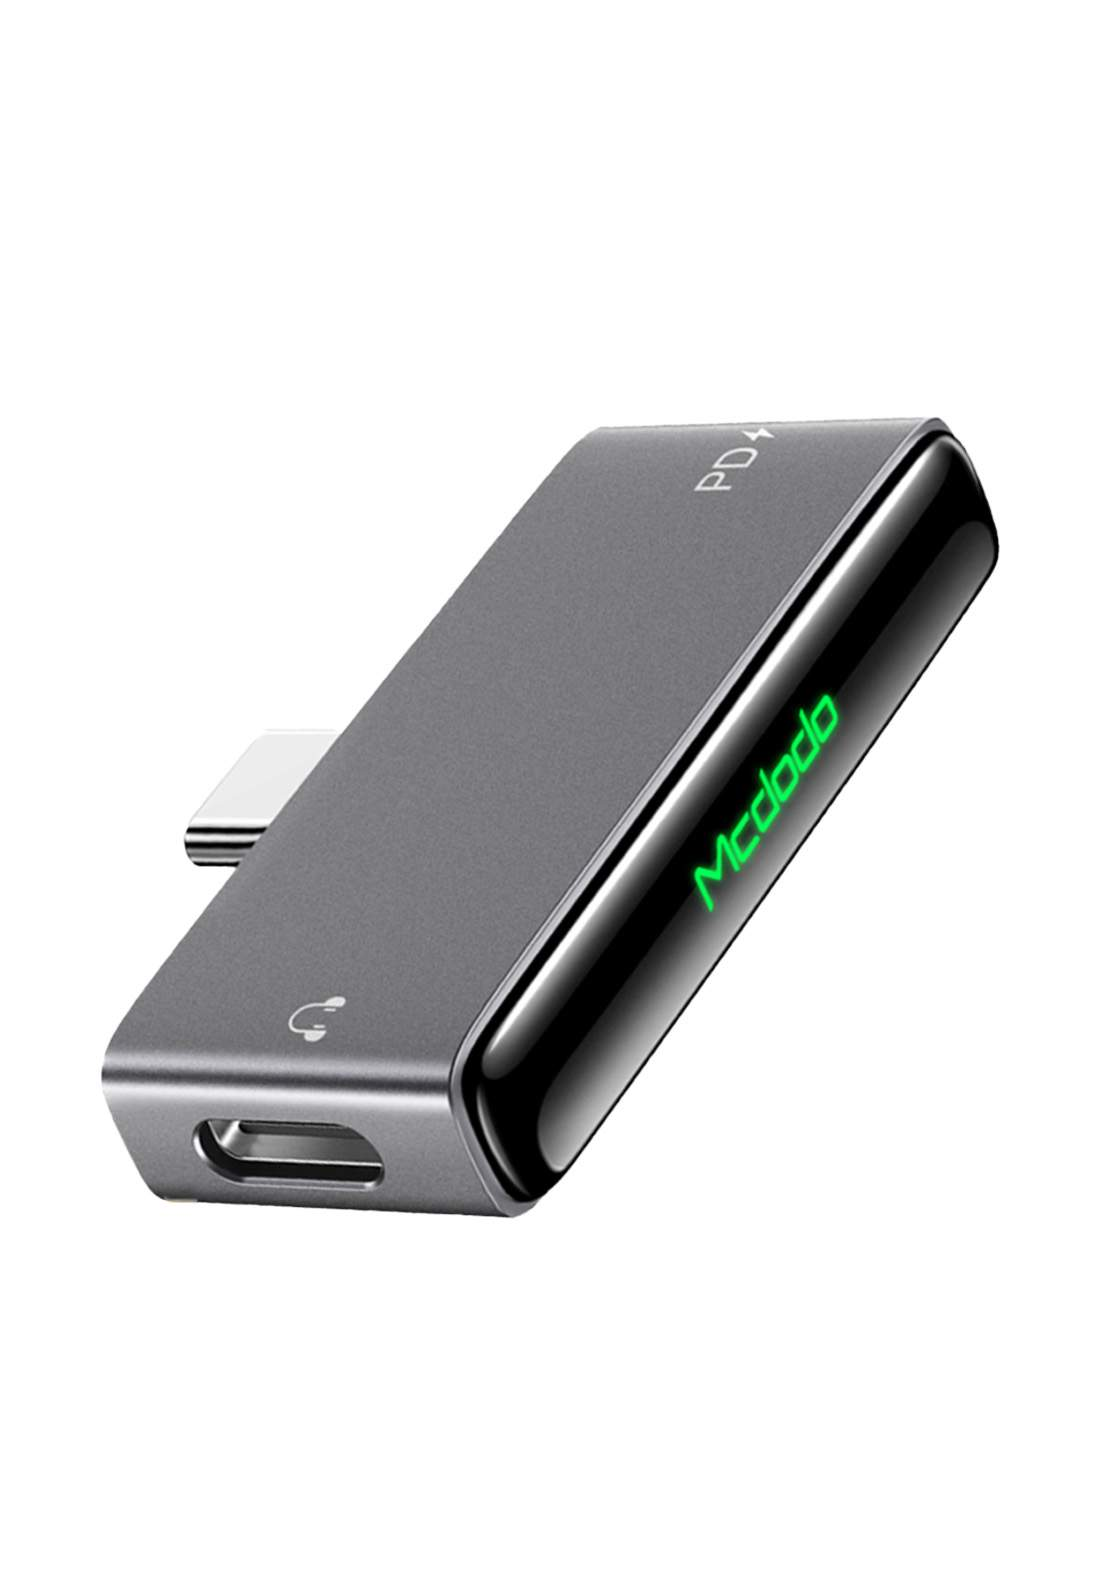 Mcdodo Type C Audio Adapter Dual Type-C 60w Audio Charging Adapter- Black